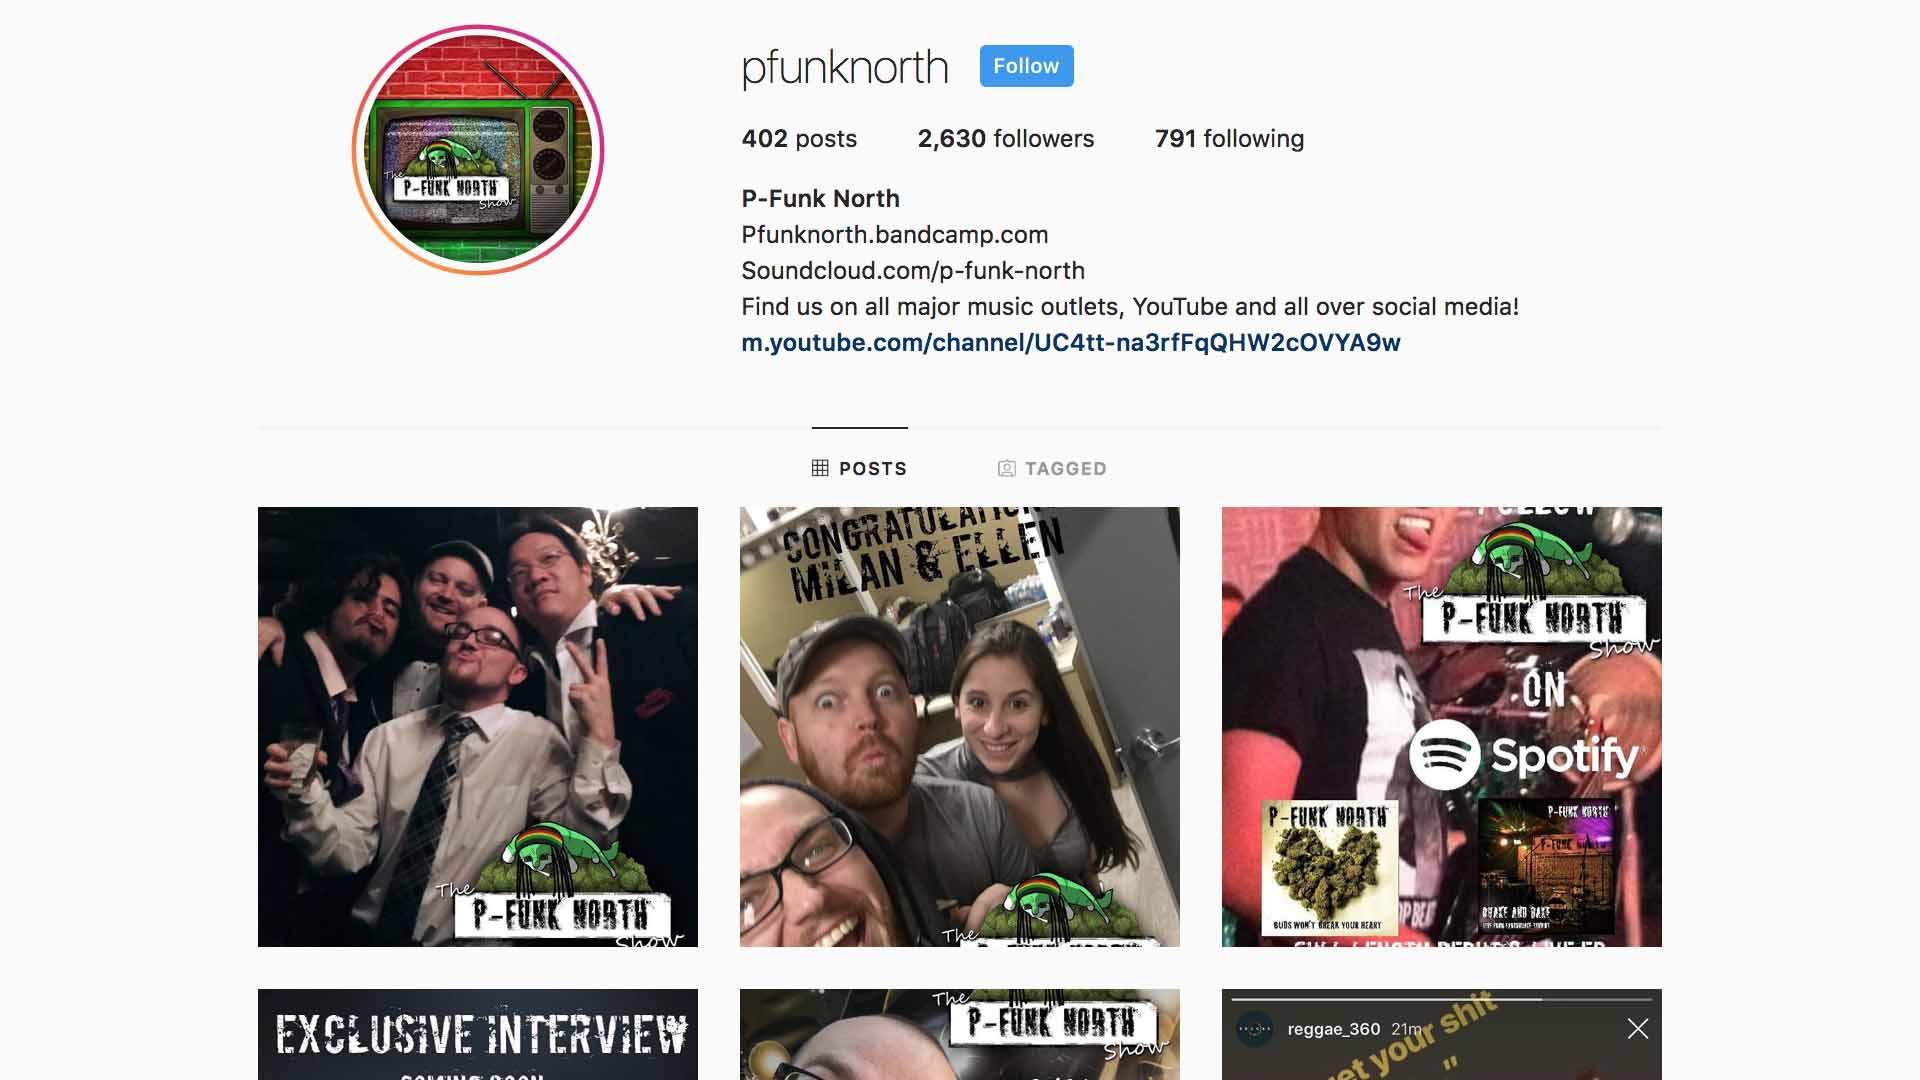 instagram.com/pfunknorth